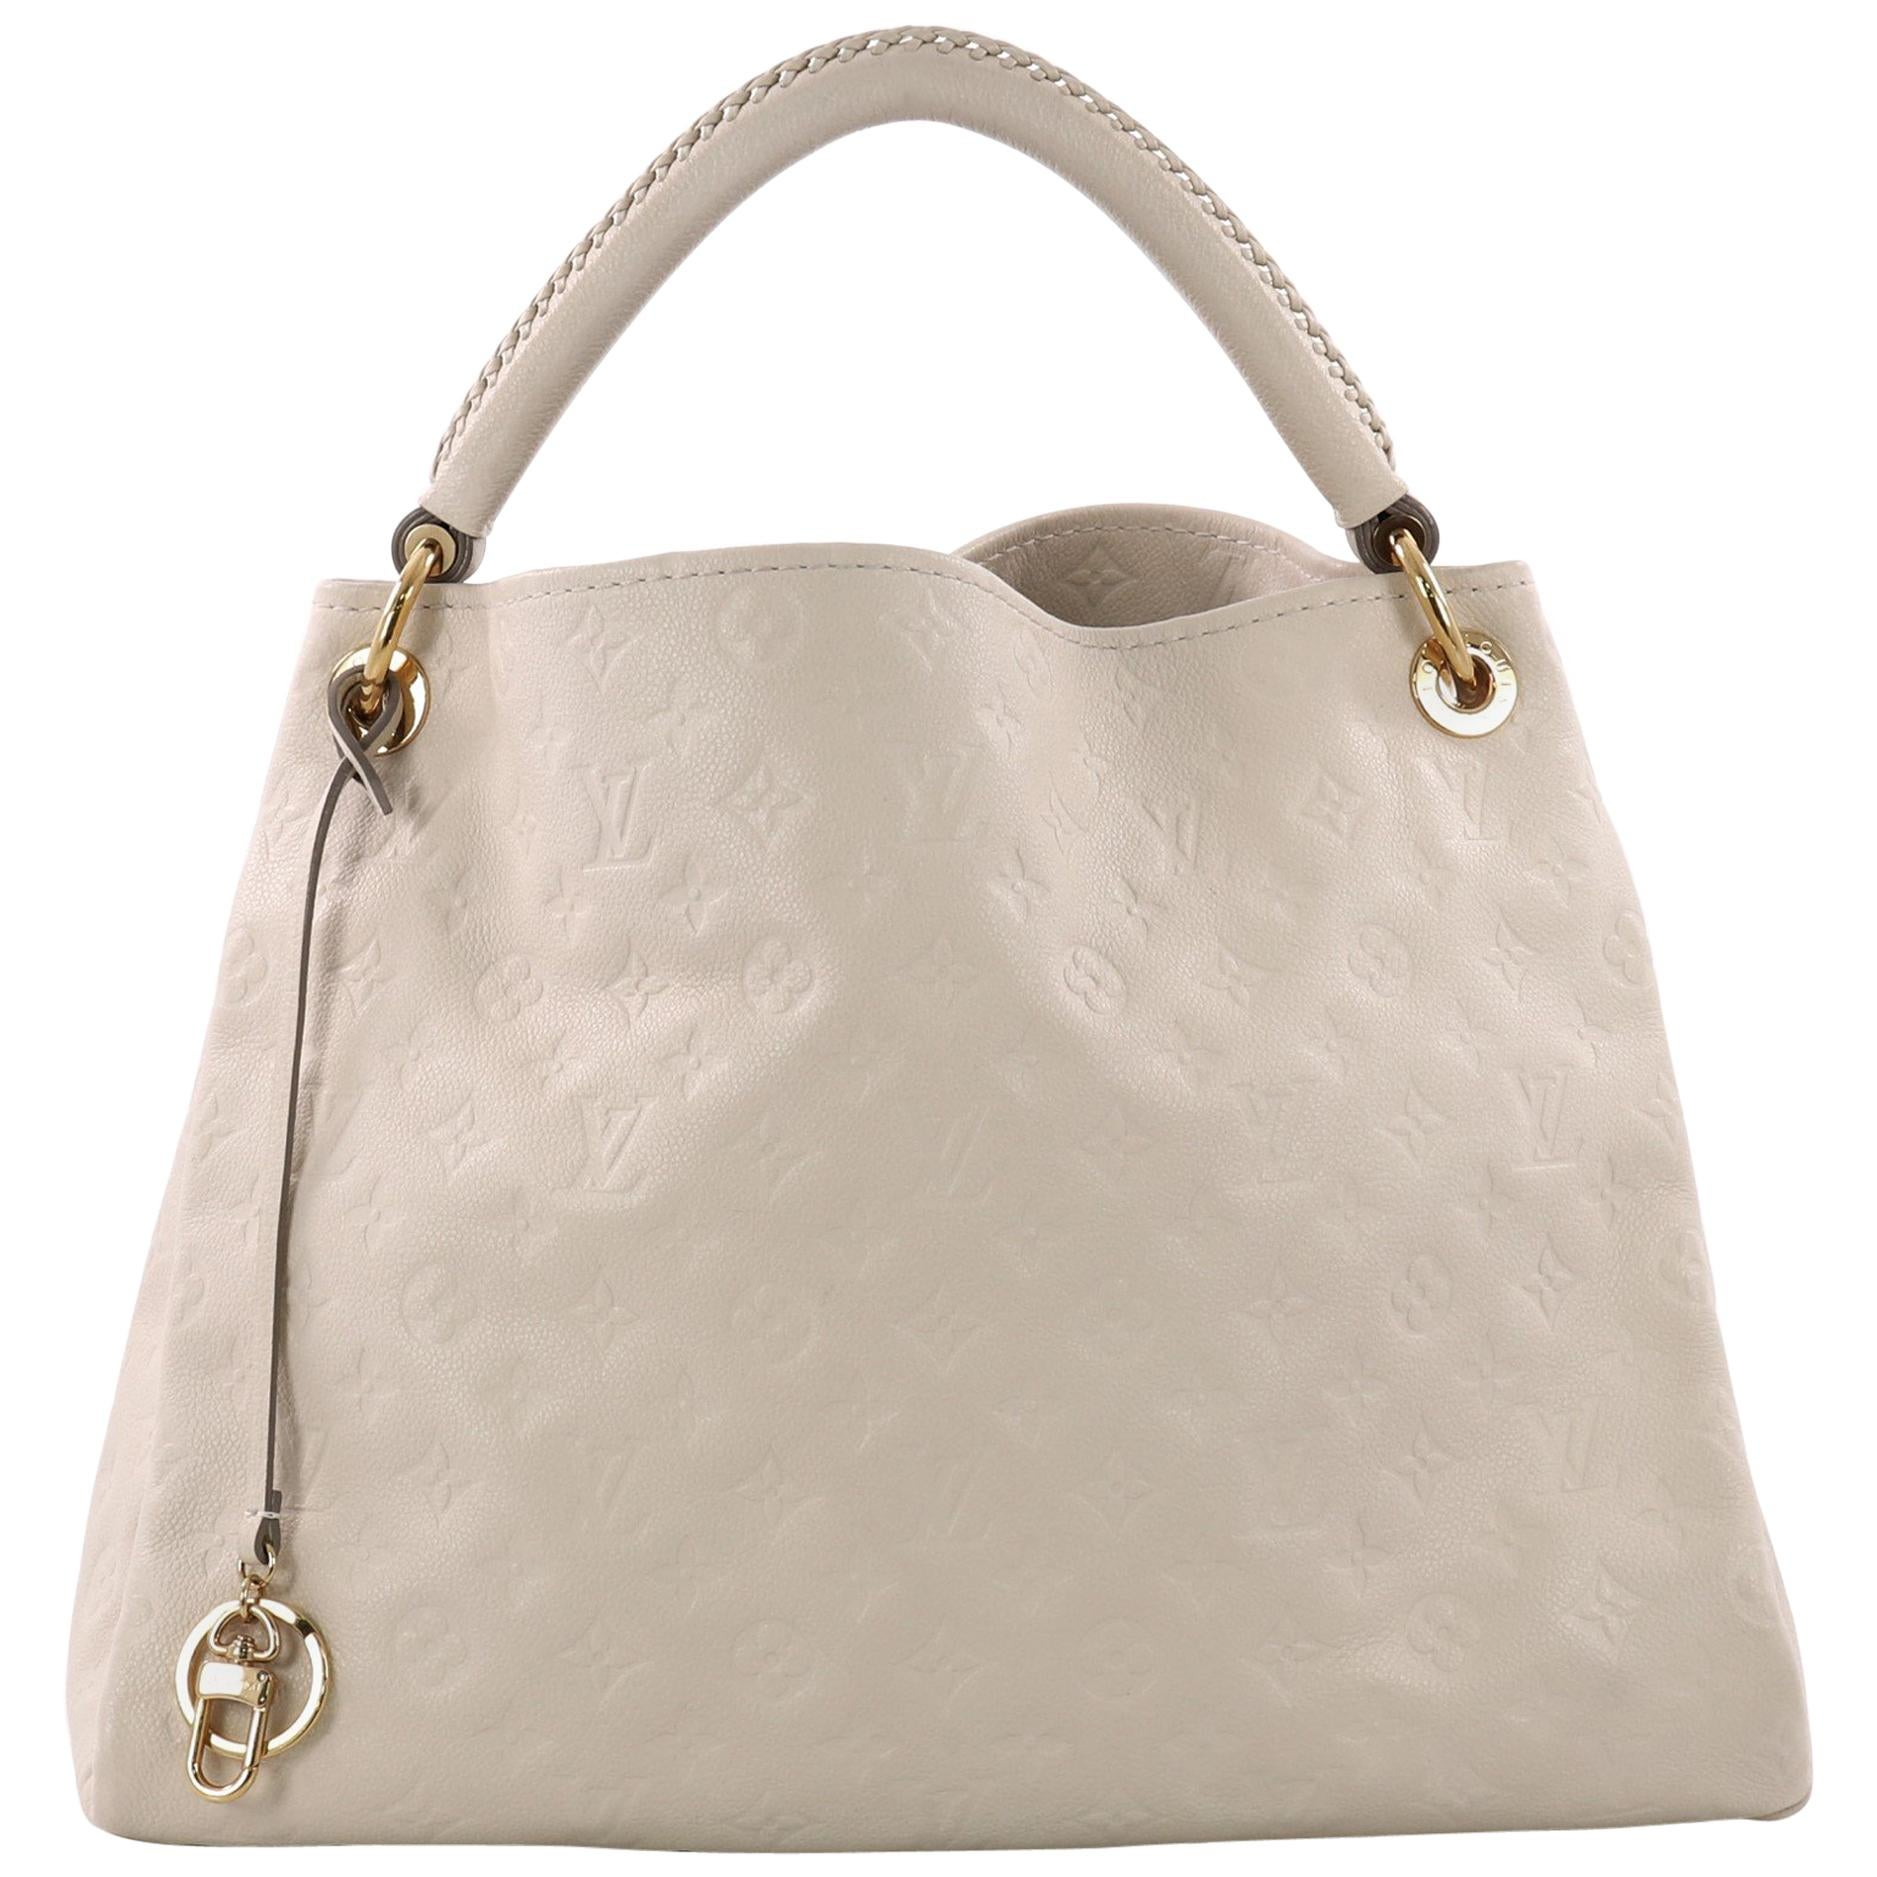 7b752efa87e6 Louis Vuitton Artsy Handbag Monogram Empreinte Leather MM at 1stdibs